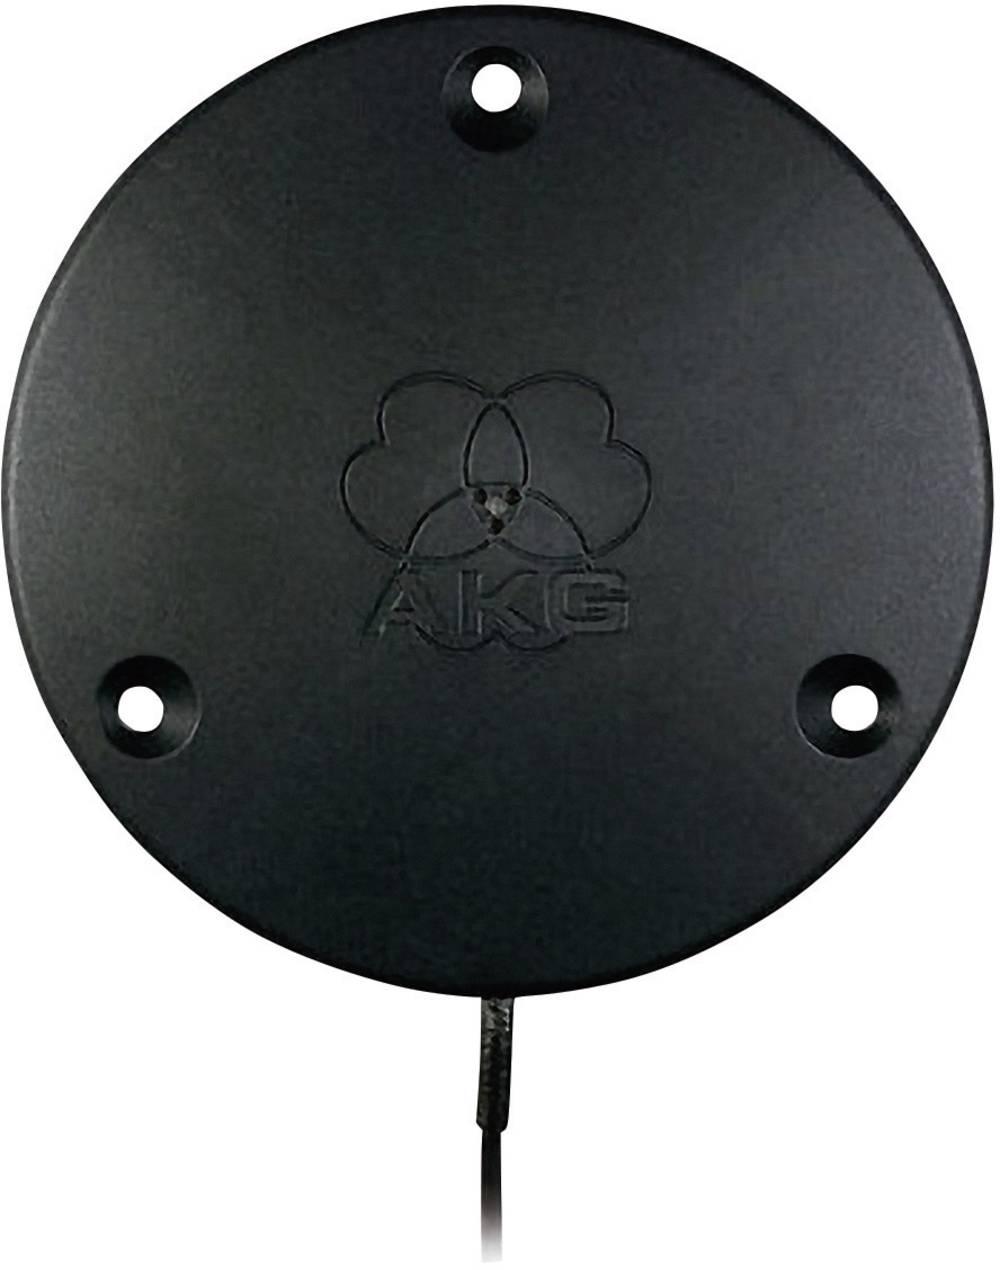 Stoječi mikrofon za govor AKG CBL99 žični